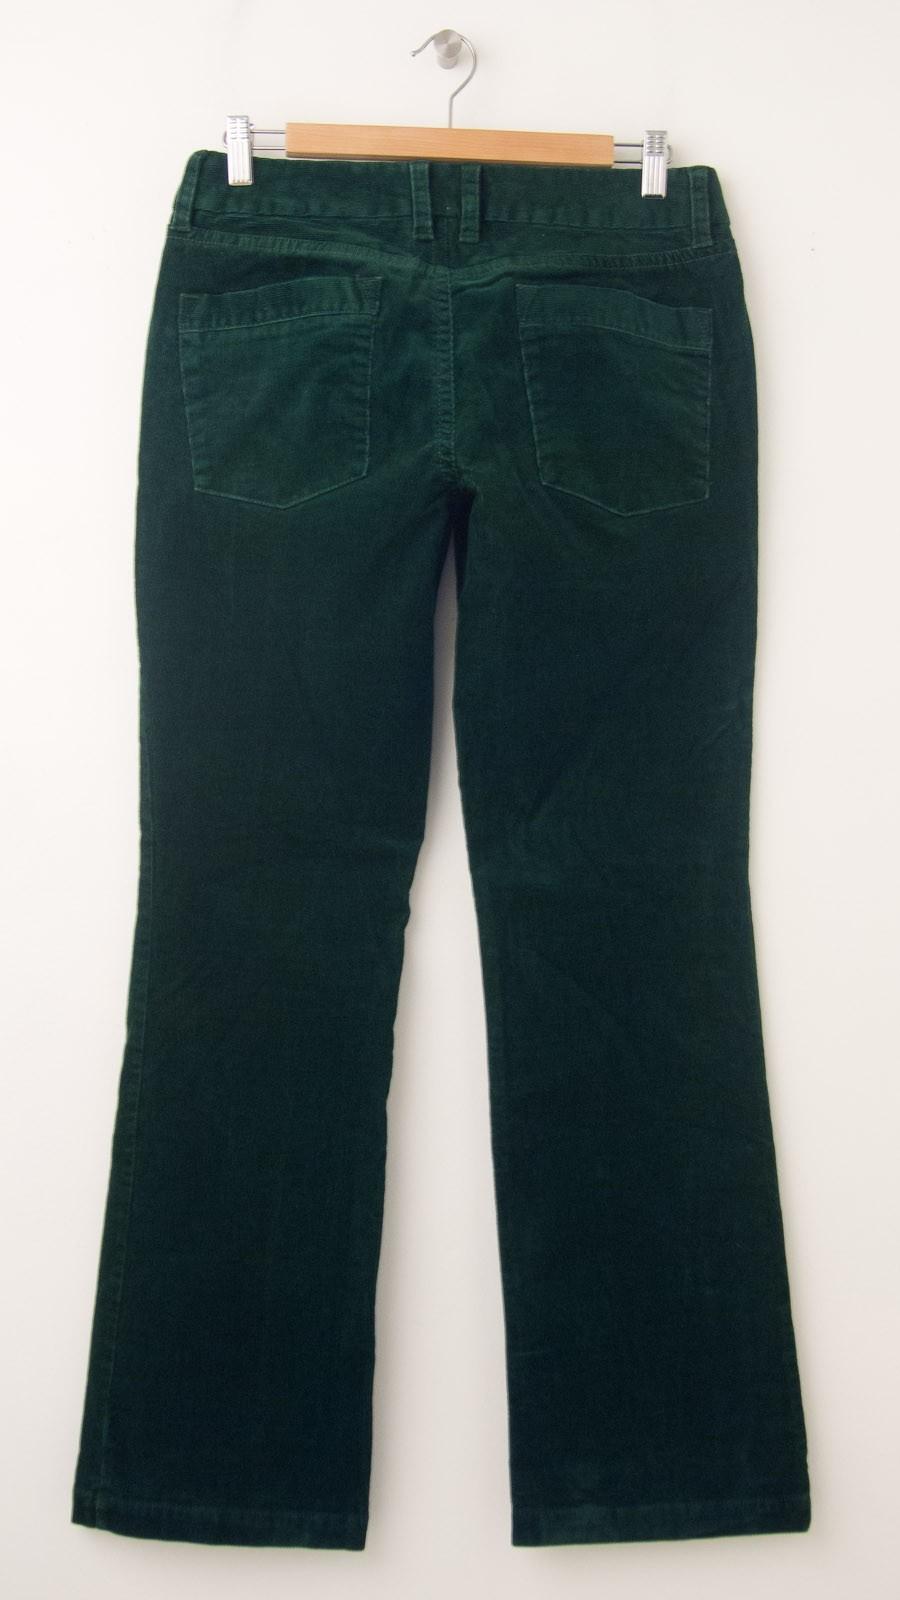 d048039c4f4 J. Crew Favorite Fit Stretch Bootcut Cord Corduroy Pants Women's 4S ...